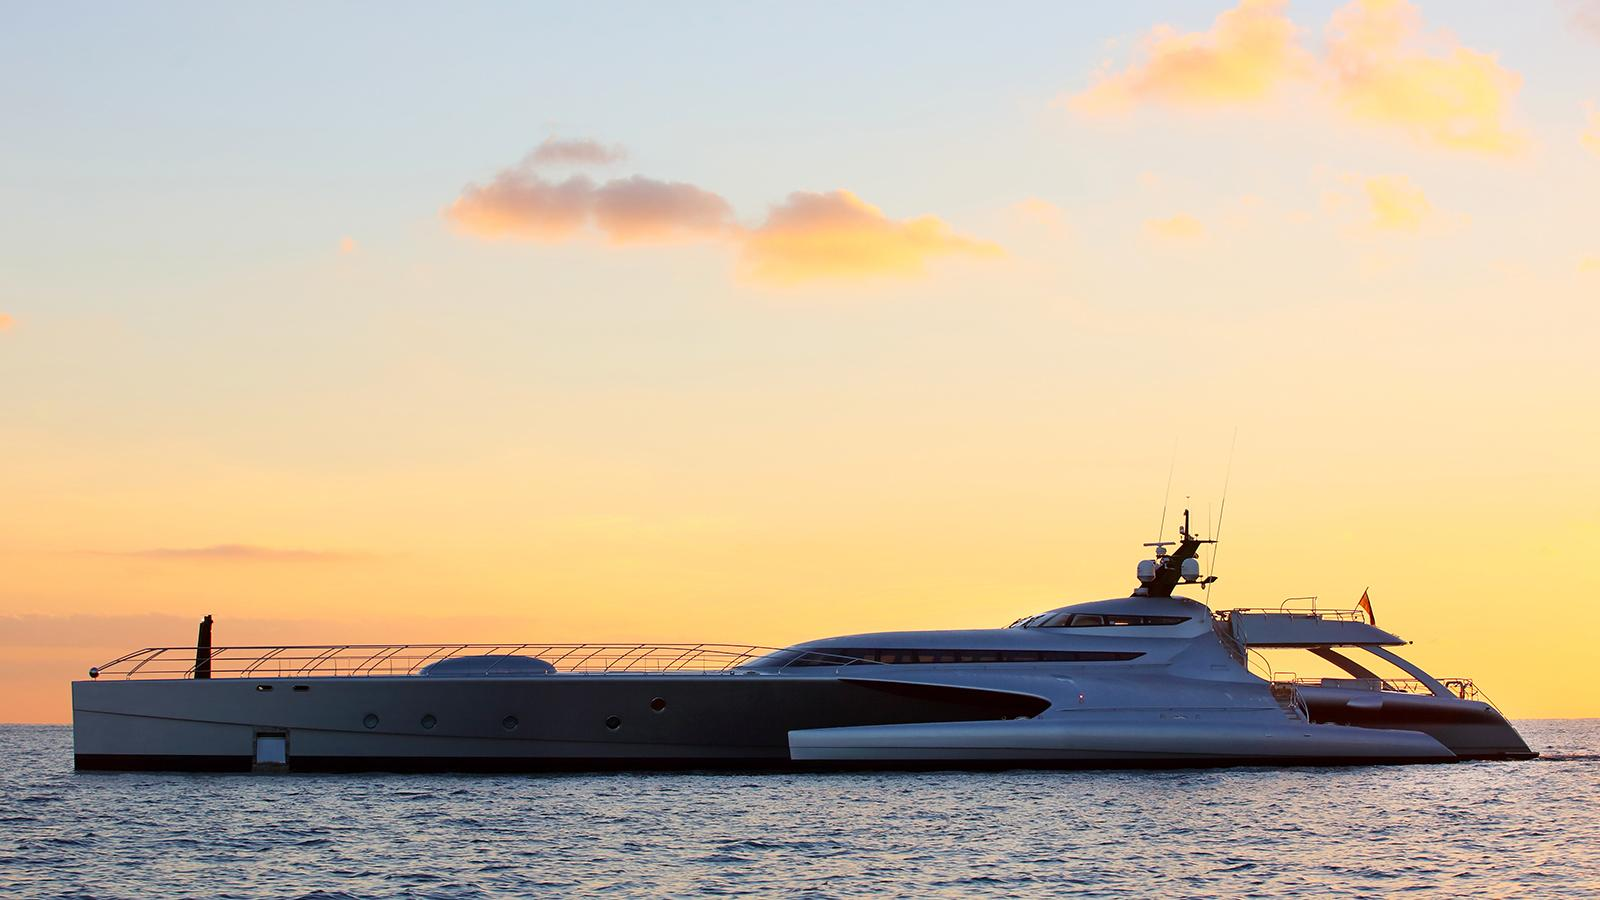 galaxy of happiness trimaran yacht latitude 2016 53m profile sunrise